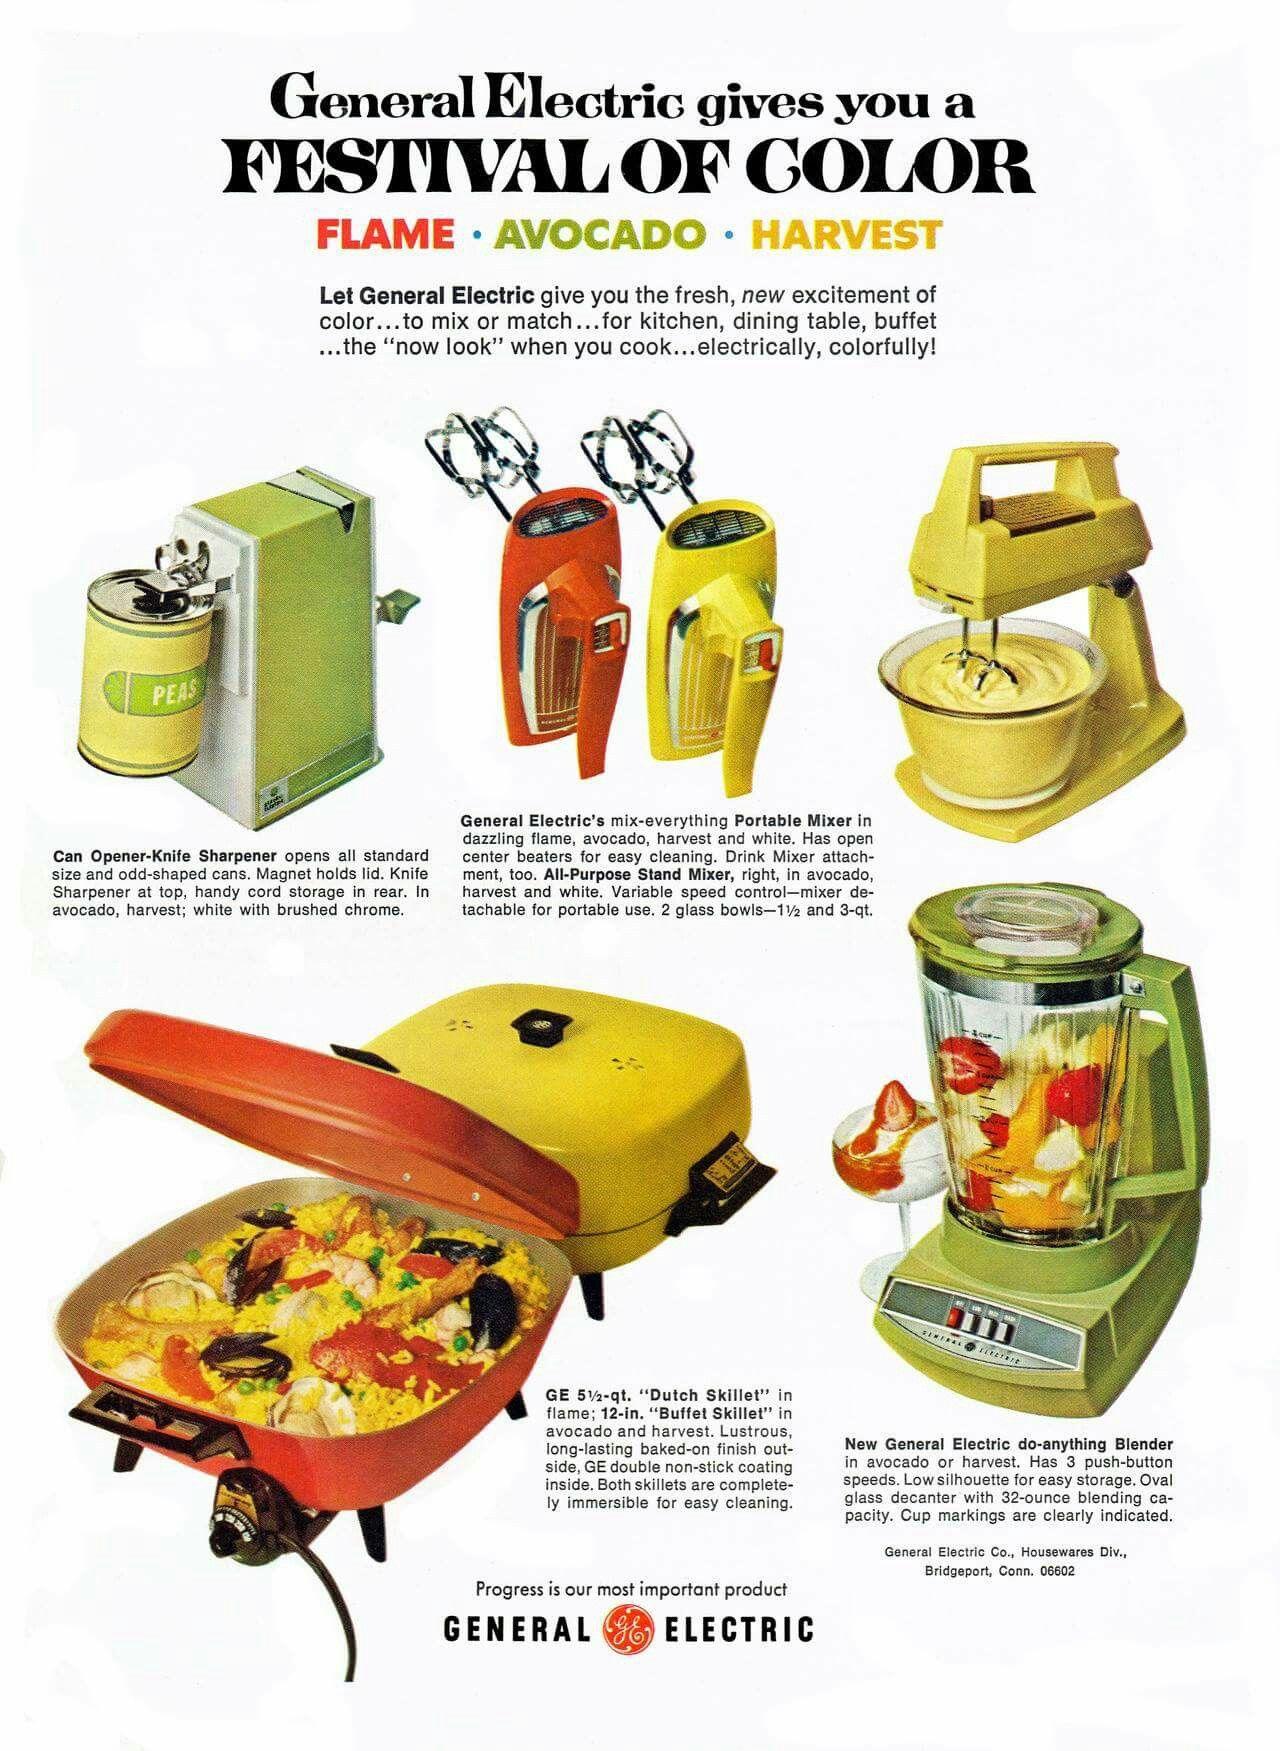 1970s Vintage Ge Small Kitchen Appliances Ad Vintage Kitchen Appliances Vintage Ads Vintage Appliances